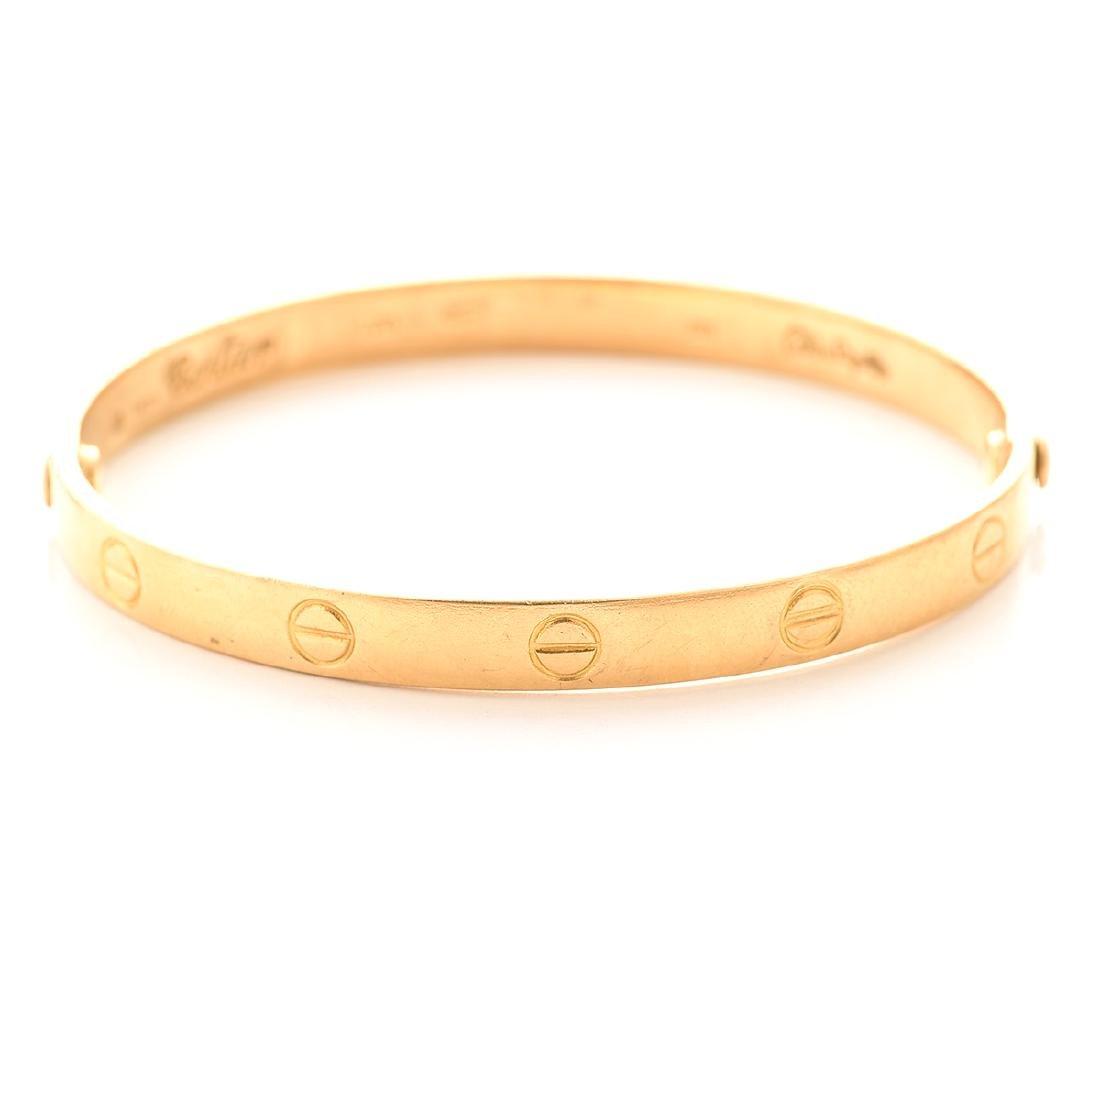 "Aldo Cipullo Cartier 18k Yellow Gold  ""Love"" Bracelet - 2"